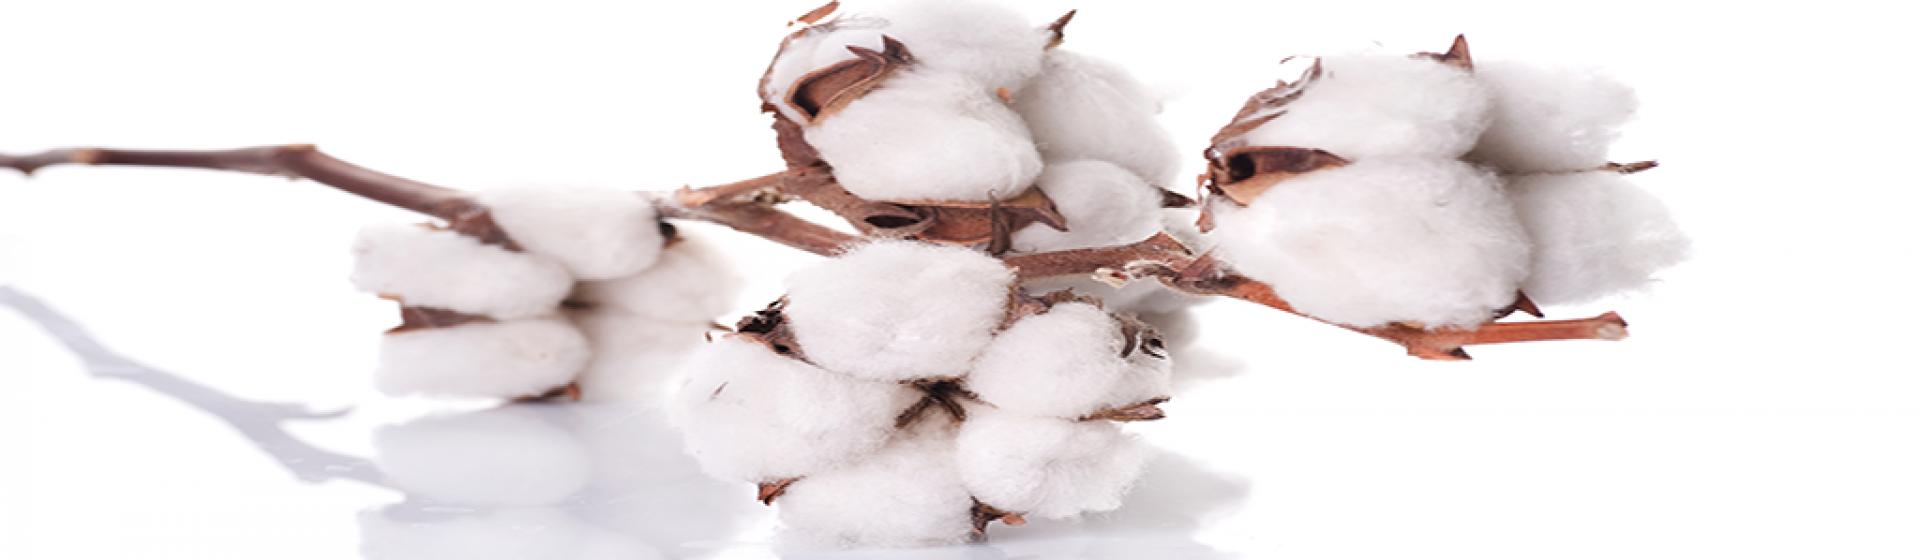 Ender Textile: Towels Bathrobes Home Textiles Turkey Manufacturer Producer Exporter